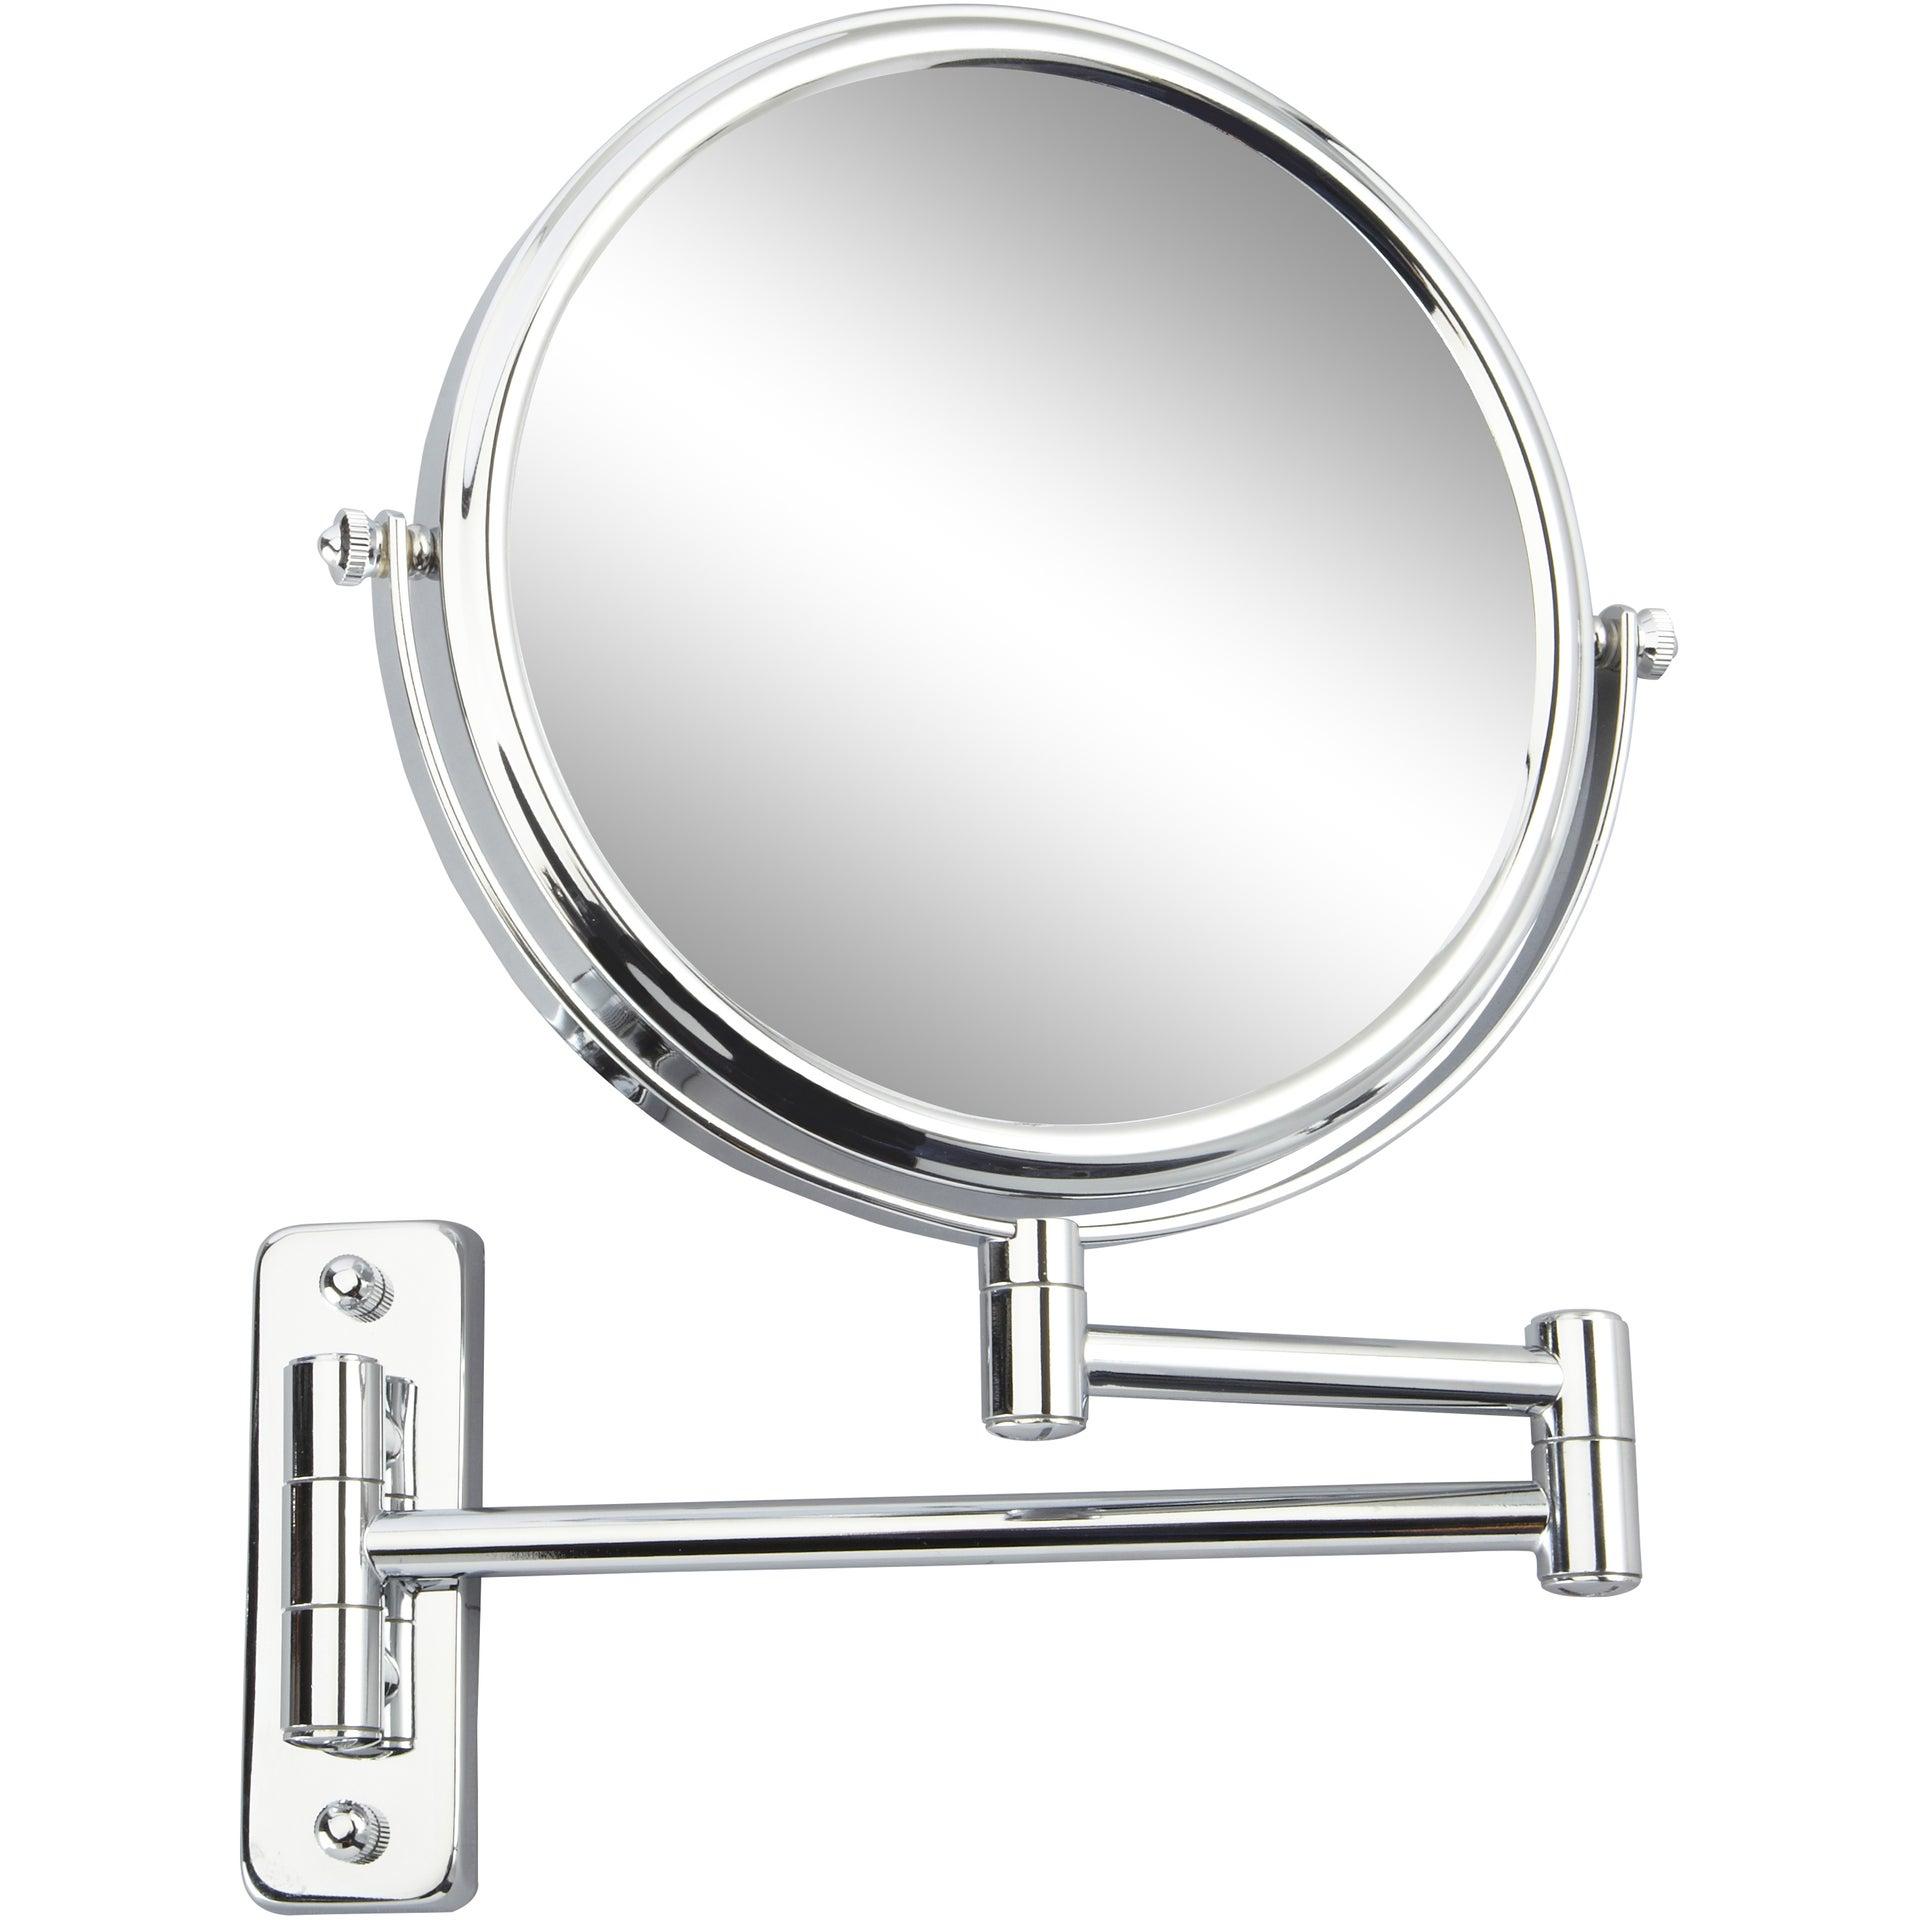 Miroir Grossissant X 10 Rond A Fixer Percage H 20 X L 20 X P 3 5cm Constance Leroy Merlin